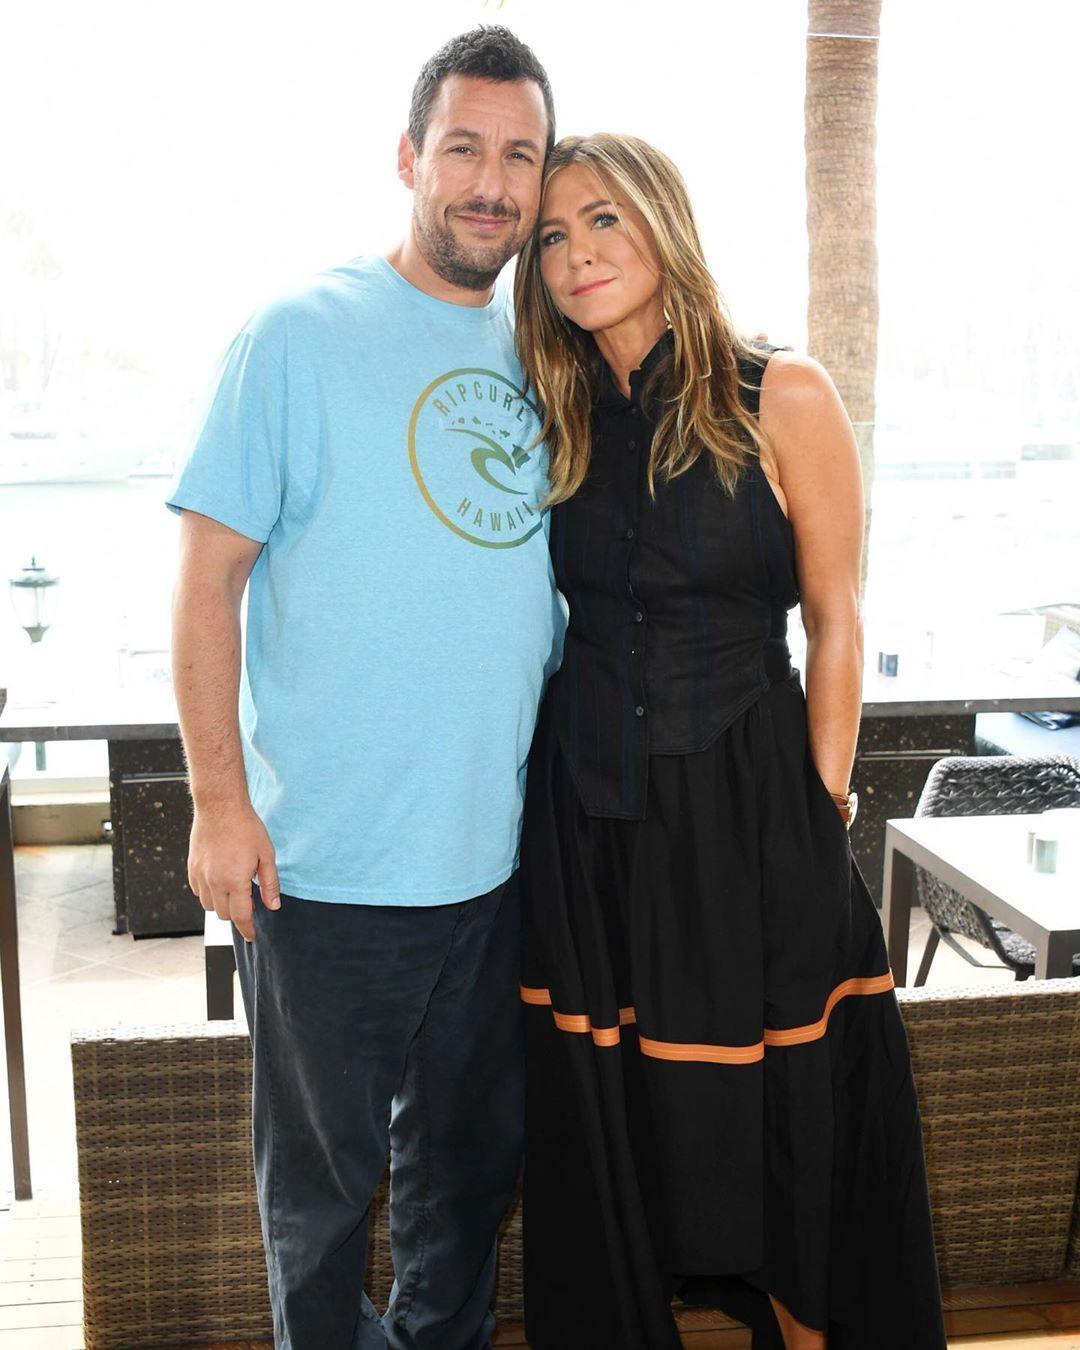 Jennifer Aniston and Adam Sandler's new movie is breaking